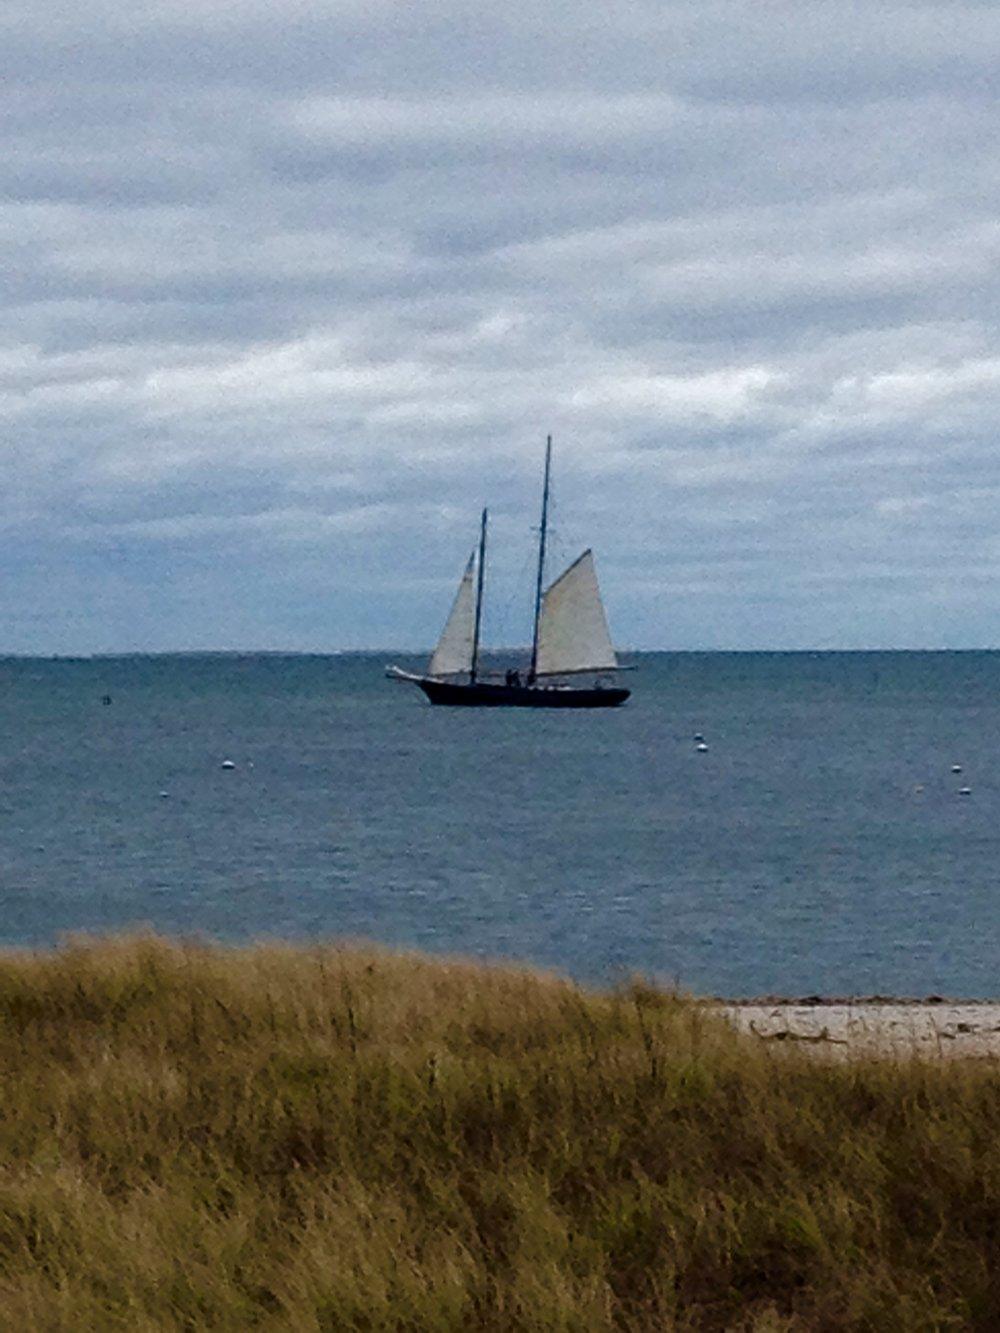 schooner tyrone at sea_unbounded adventures.jpg